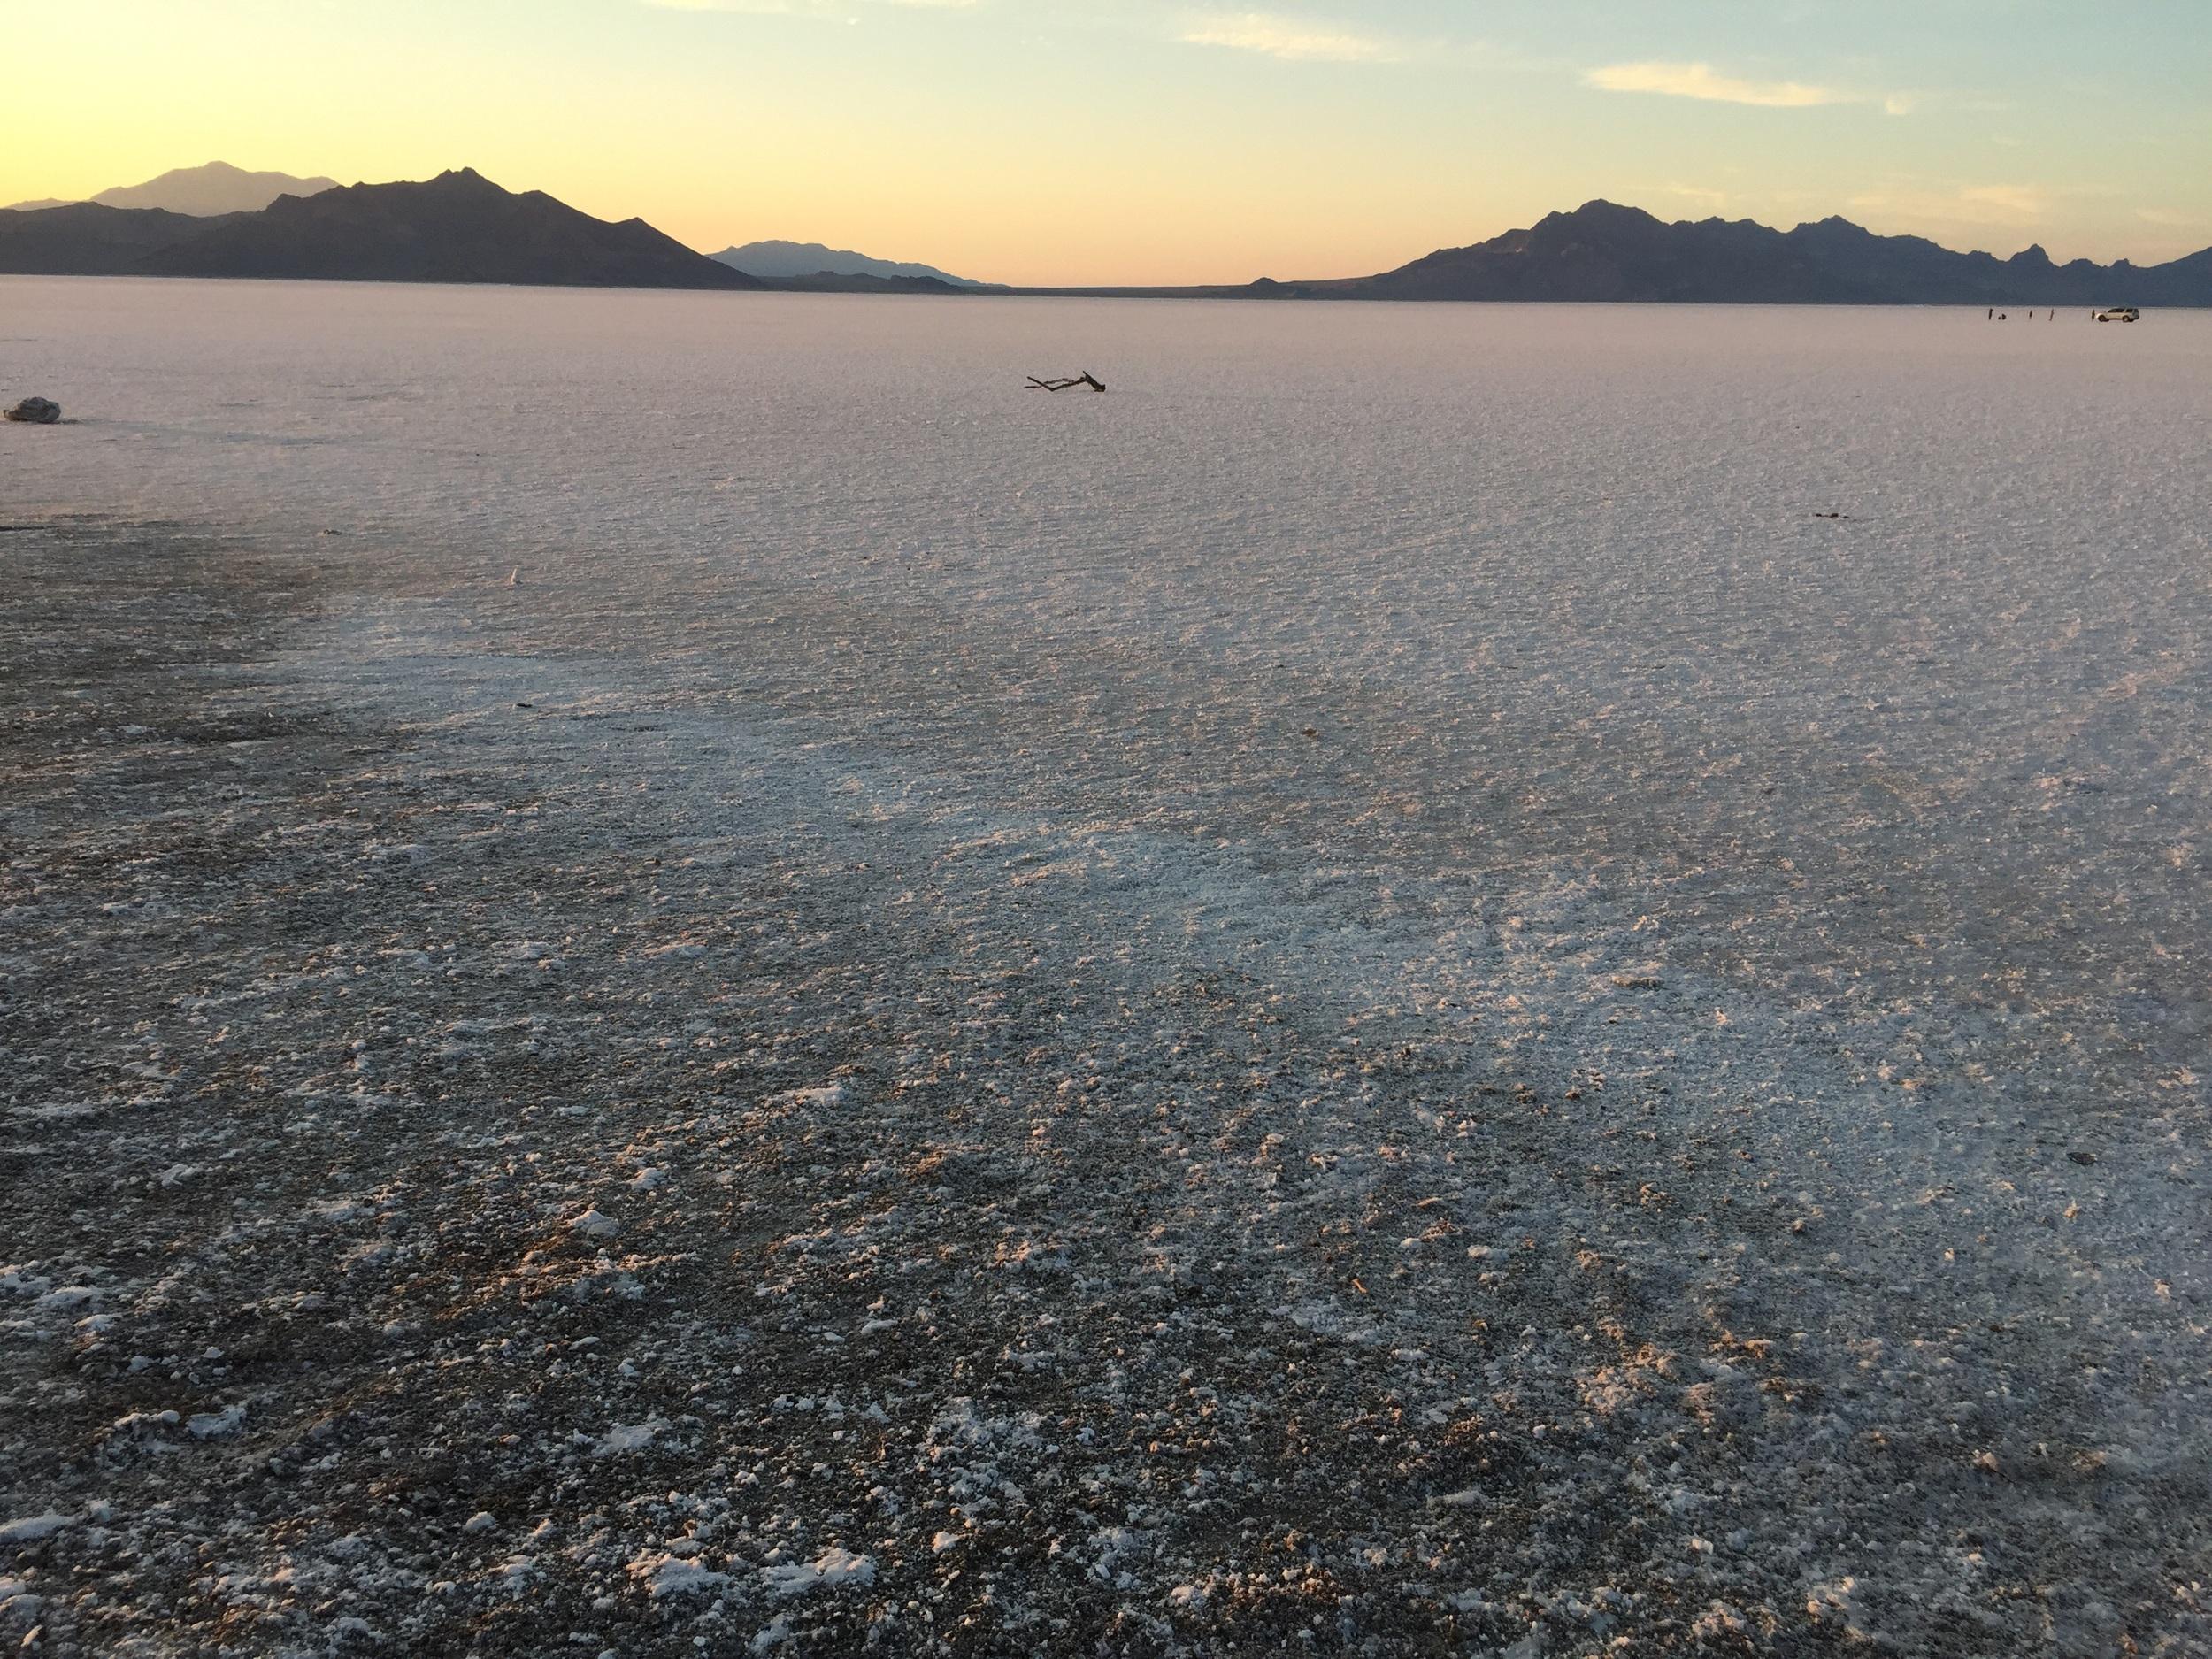 Abt 8pm Bonneville Salt Flats